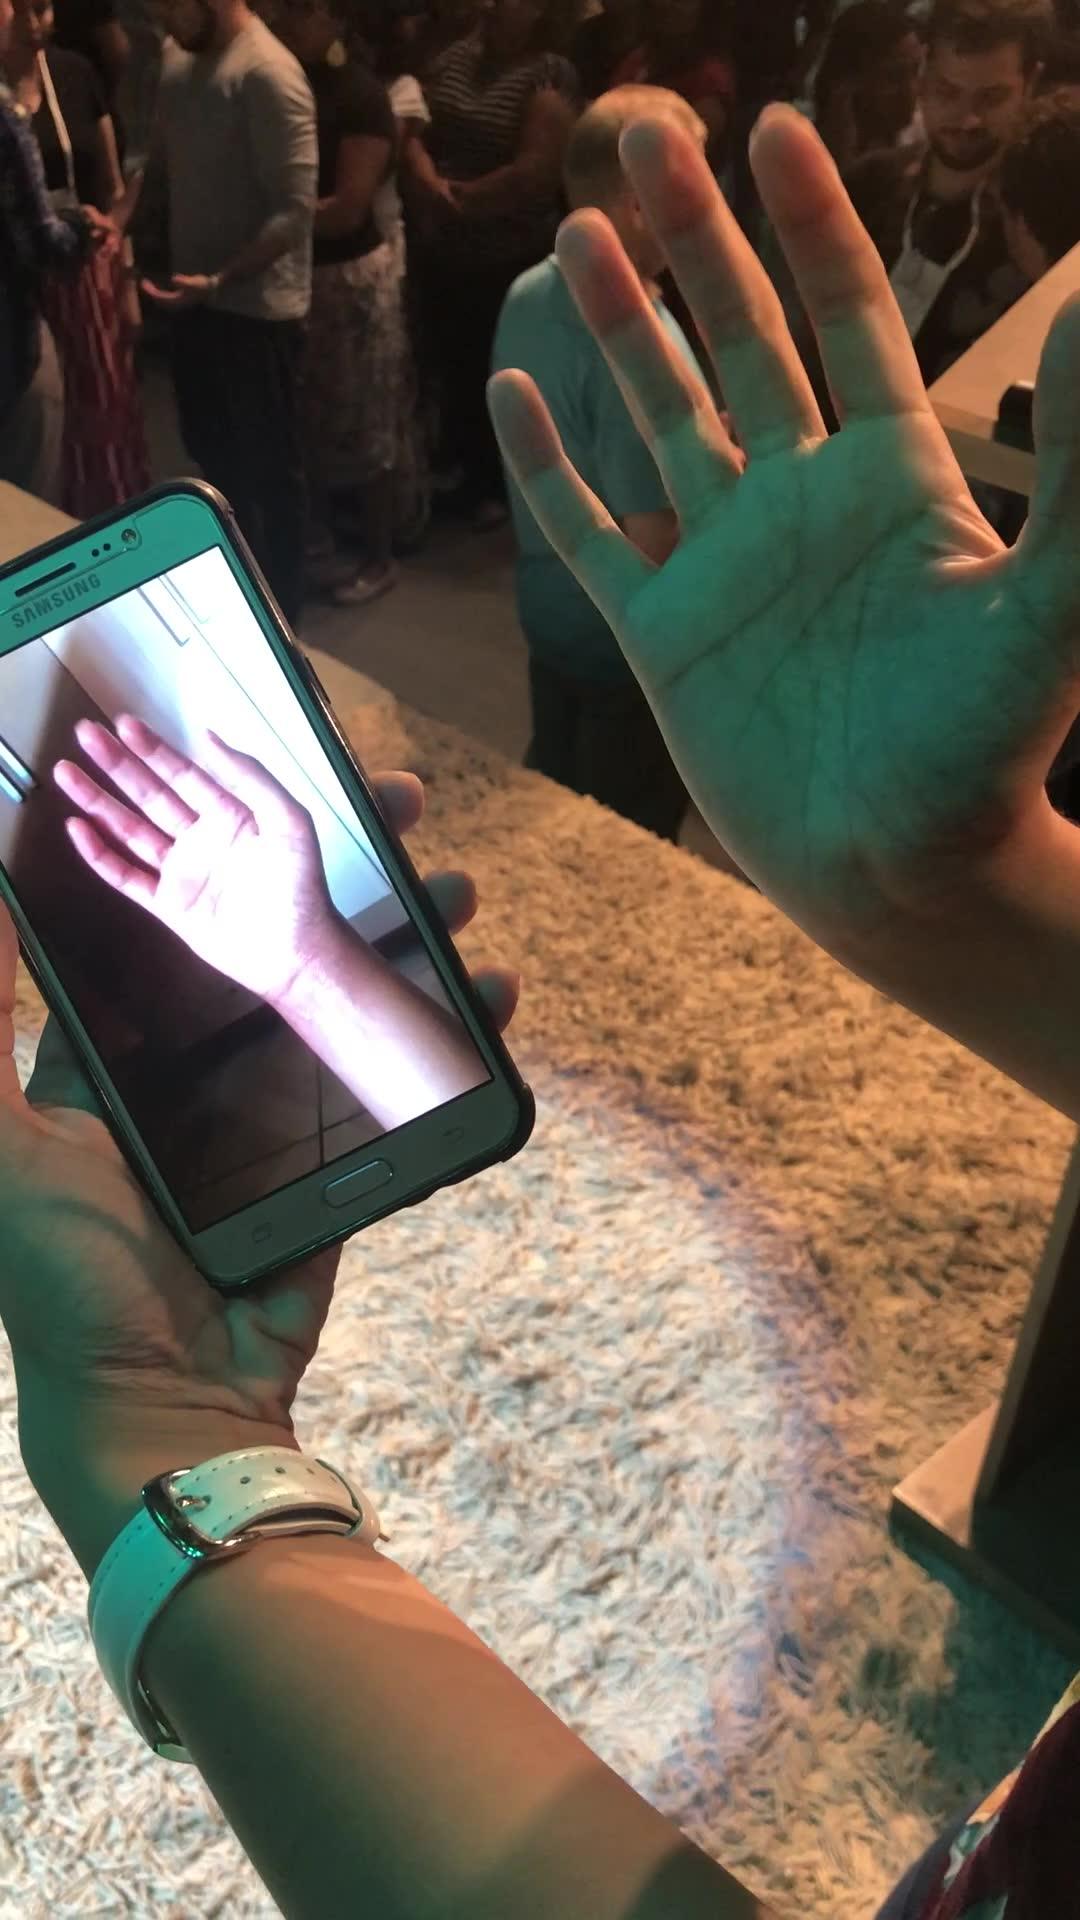 Severley Damaged Little Finger Restored